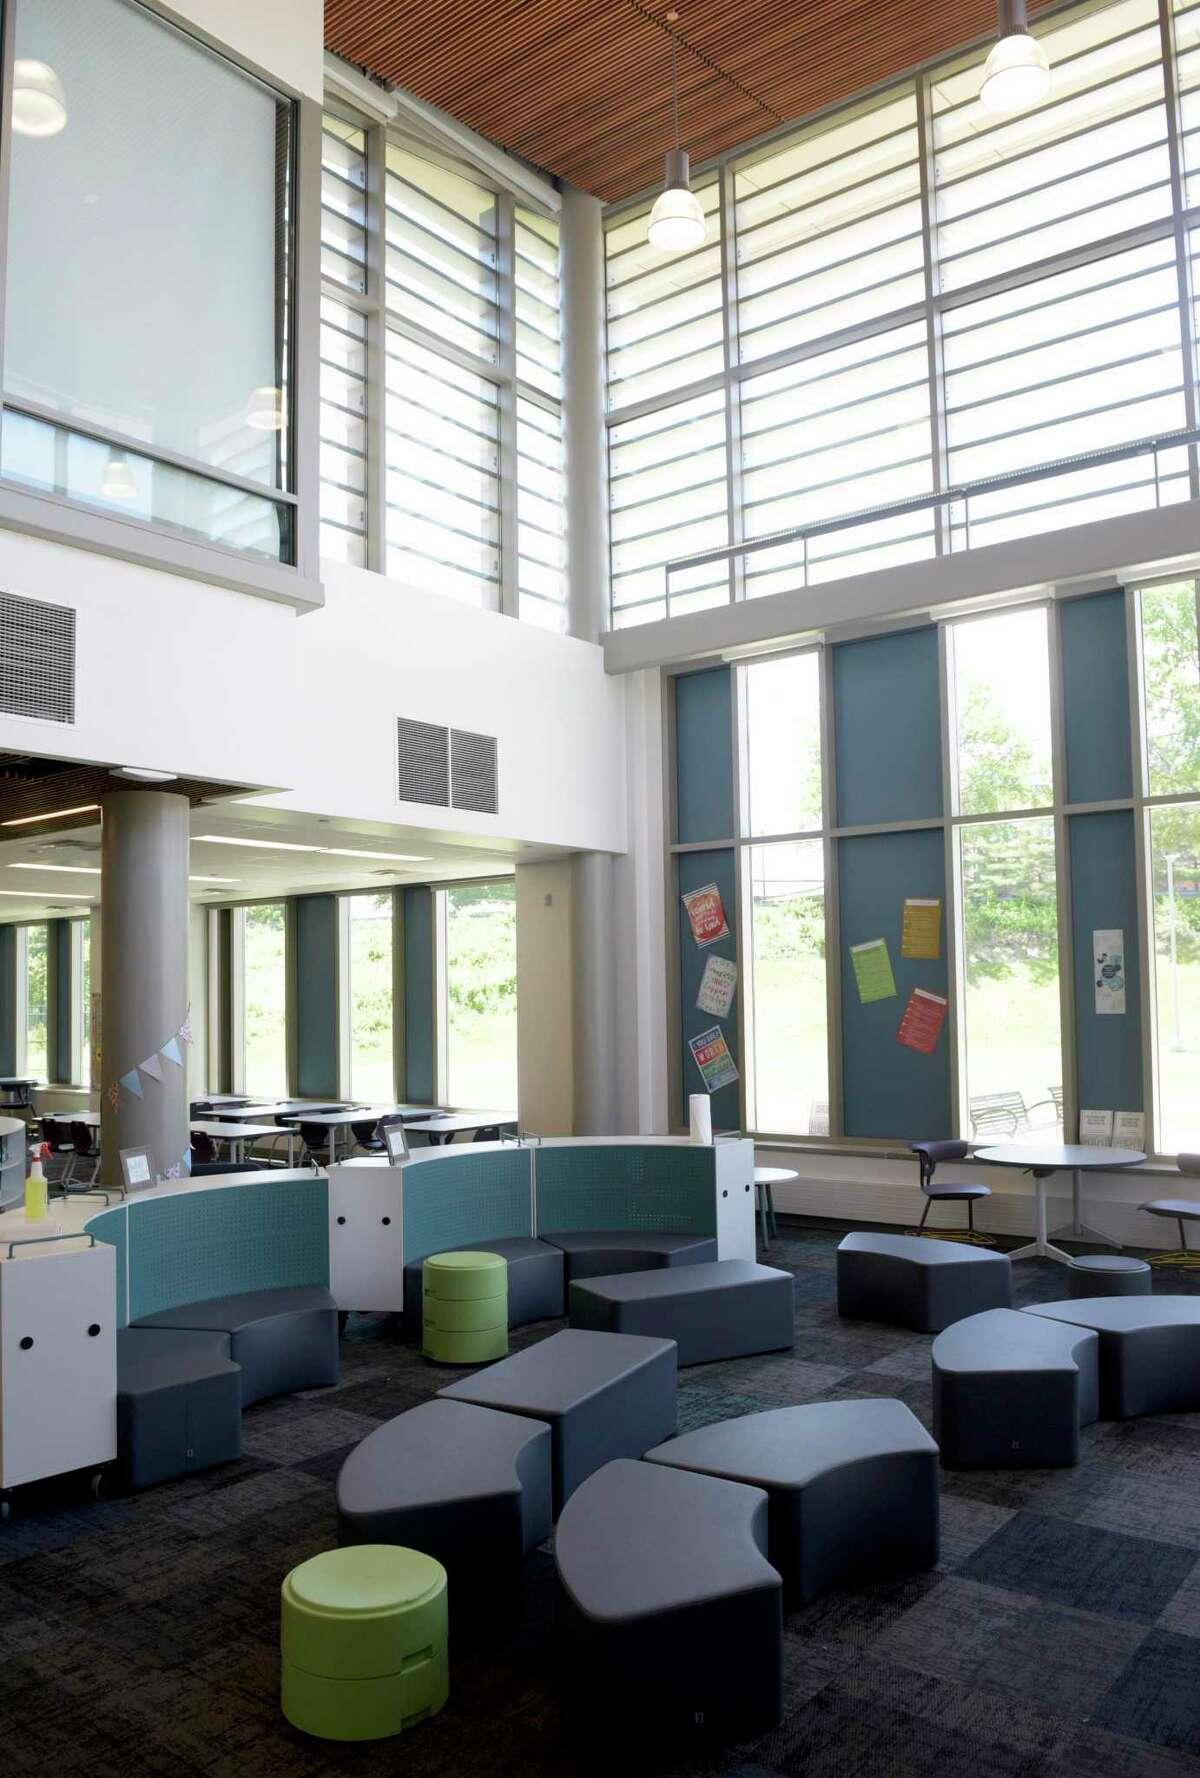 R.M.T. Johnson School. Wednesday, June 16, 2021, in Bethel, Conn.